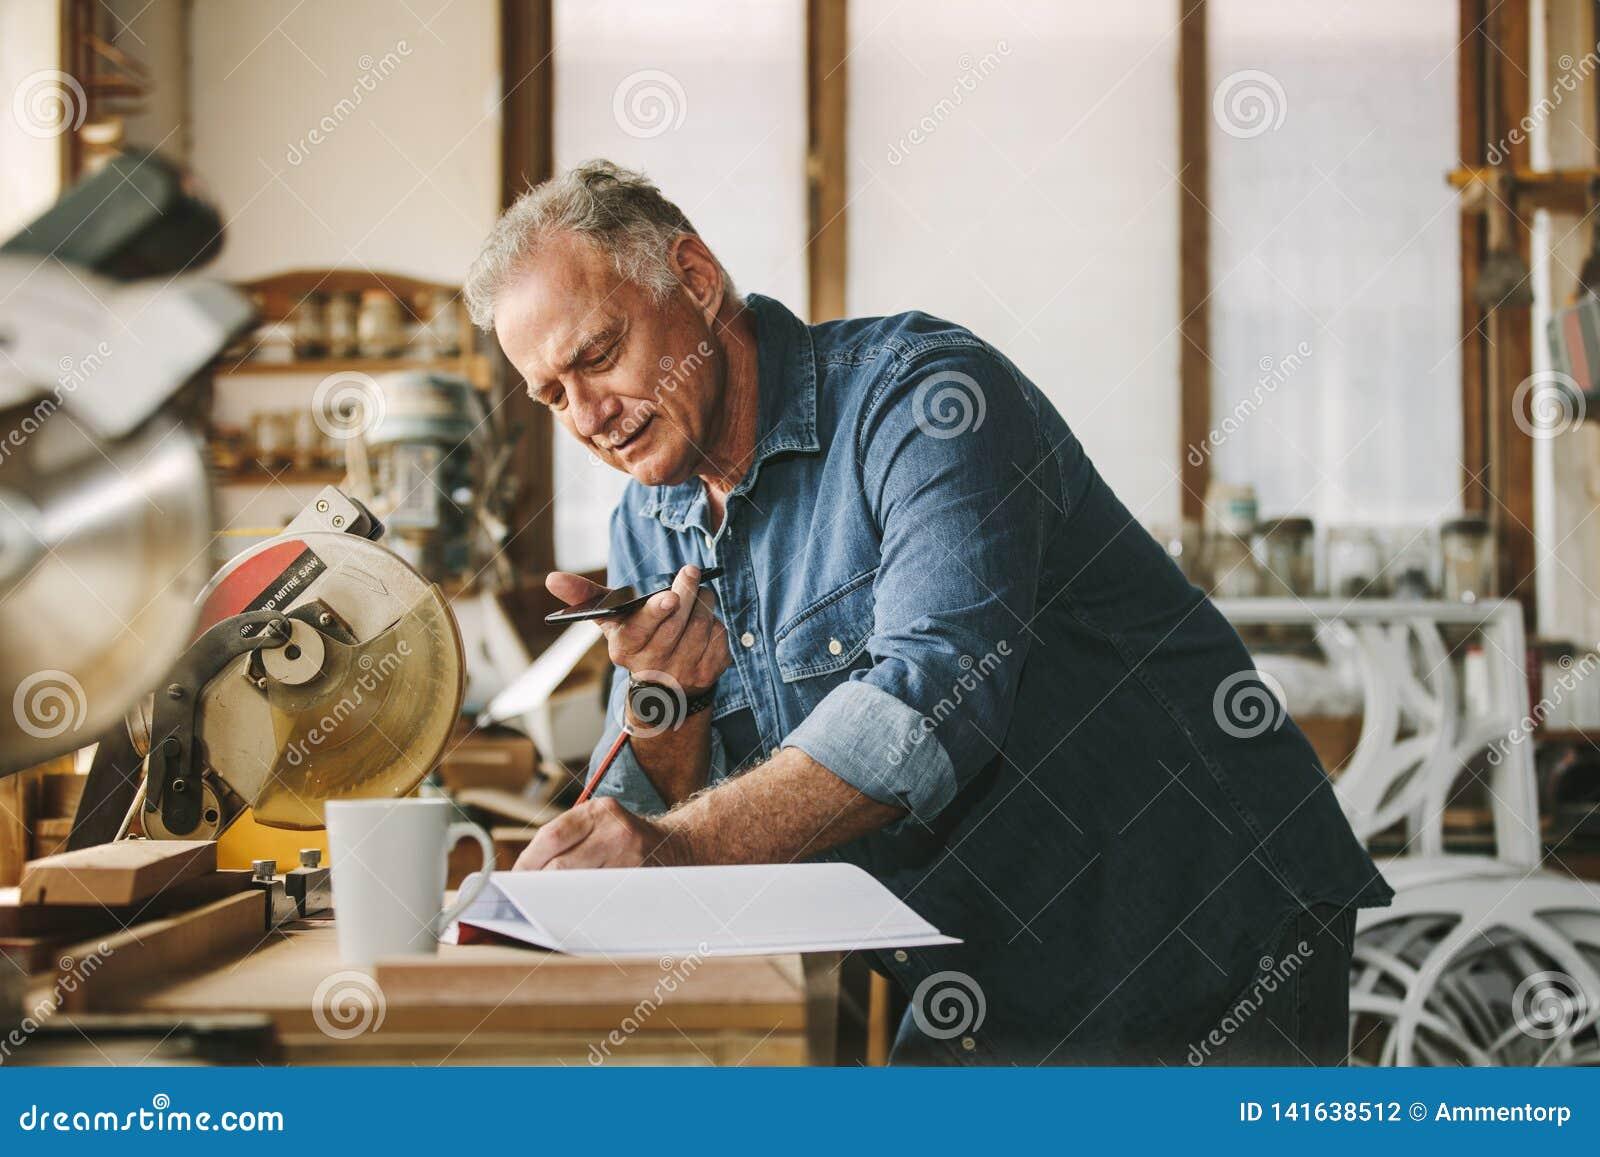 Senior carpenter working at his workshop